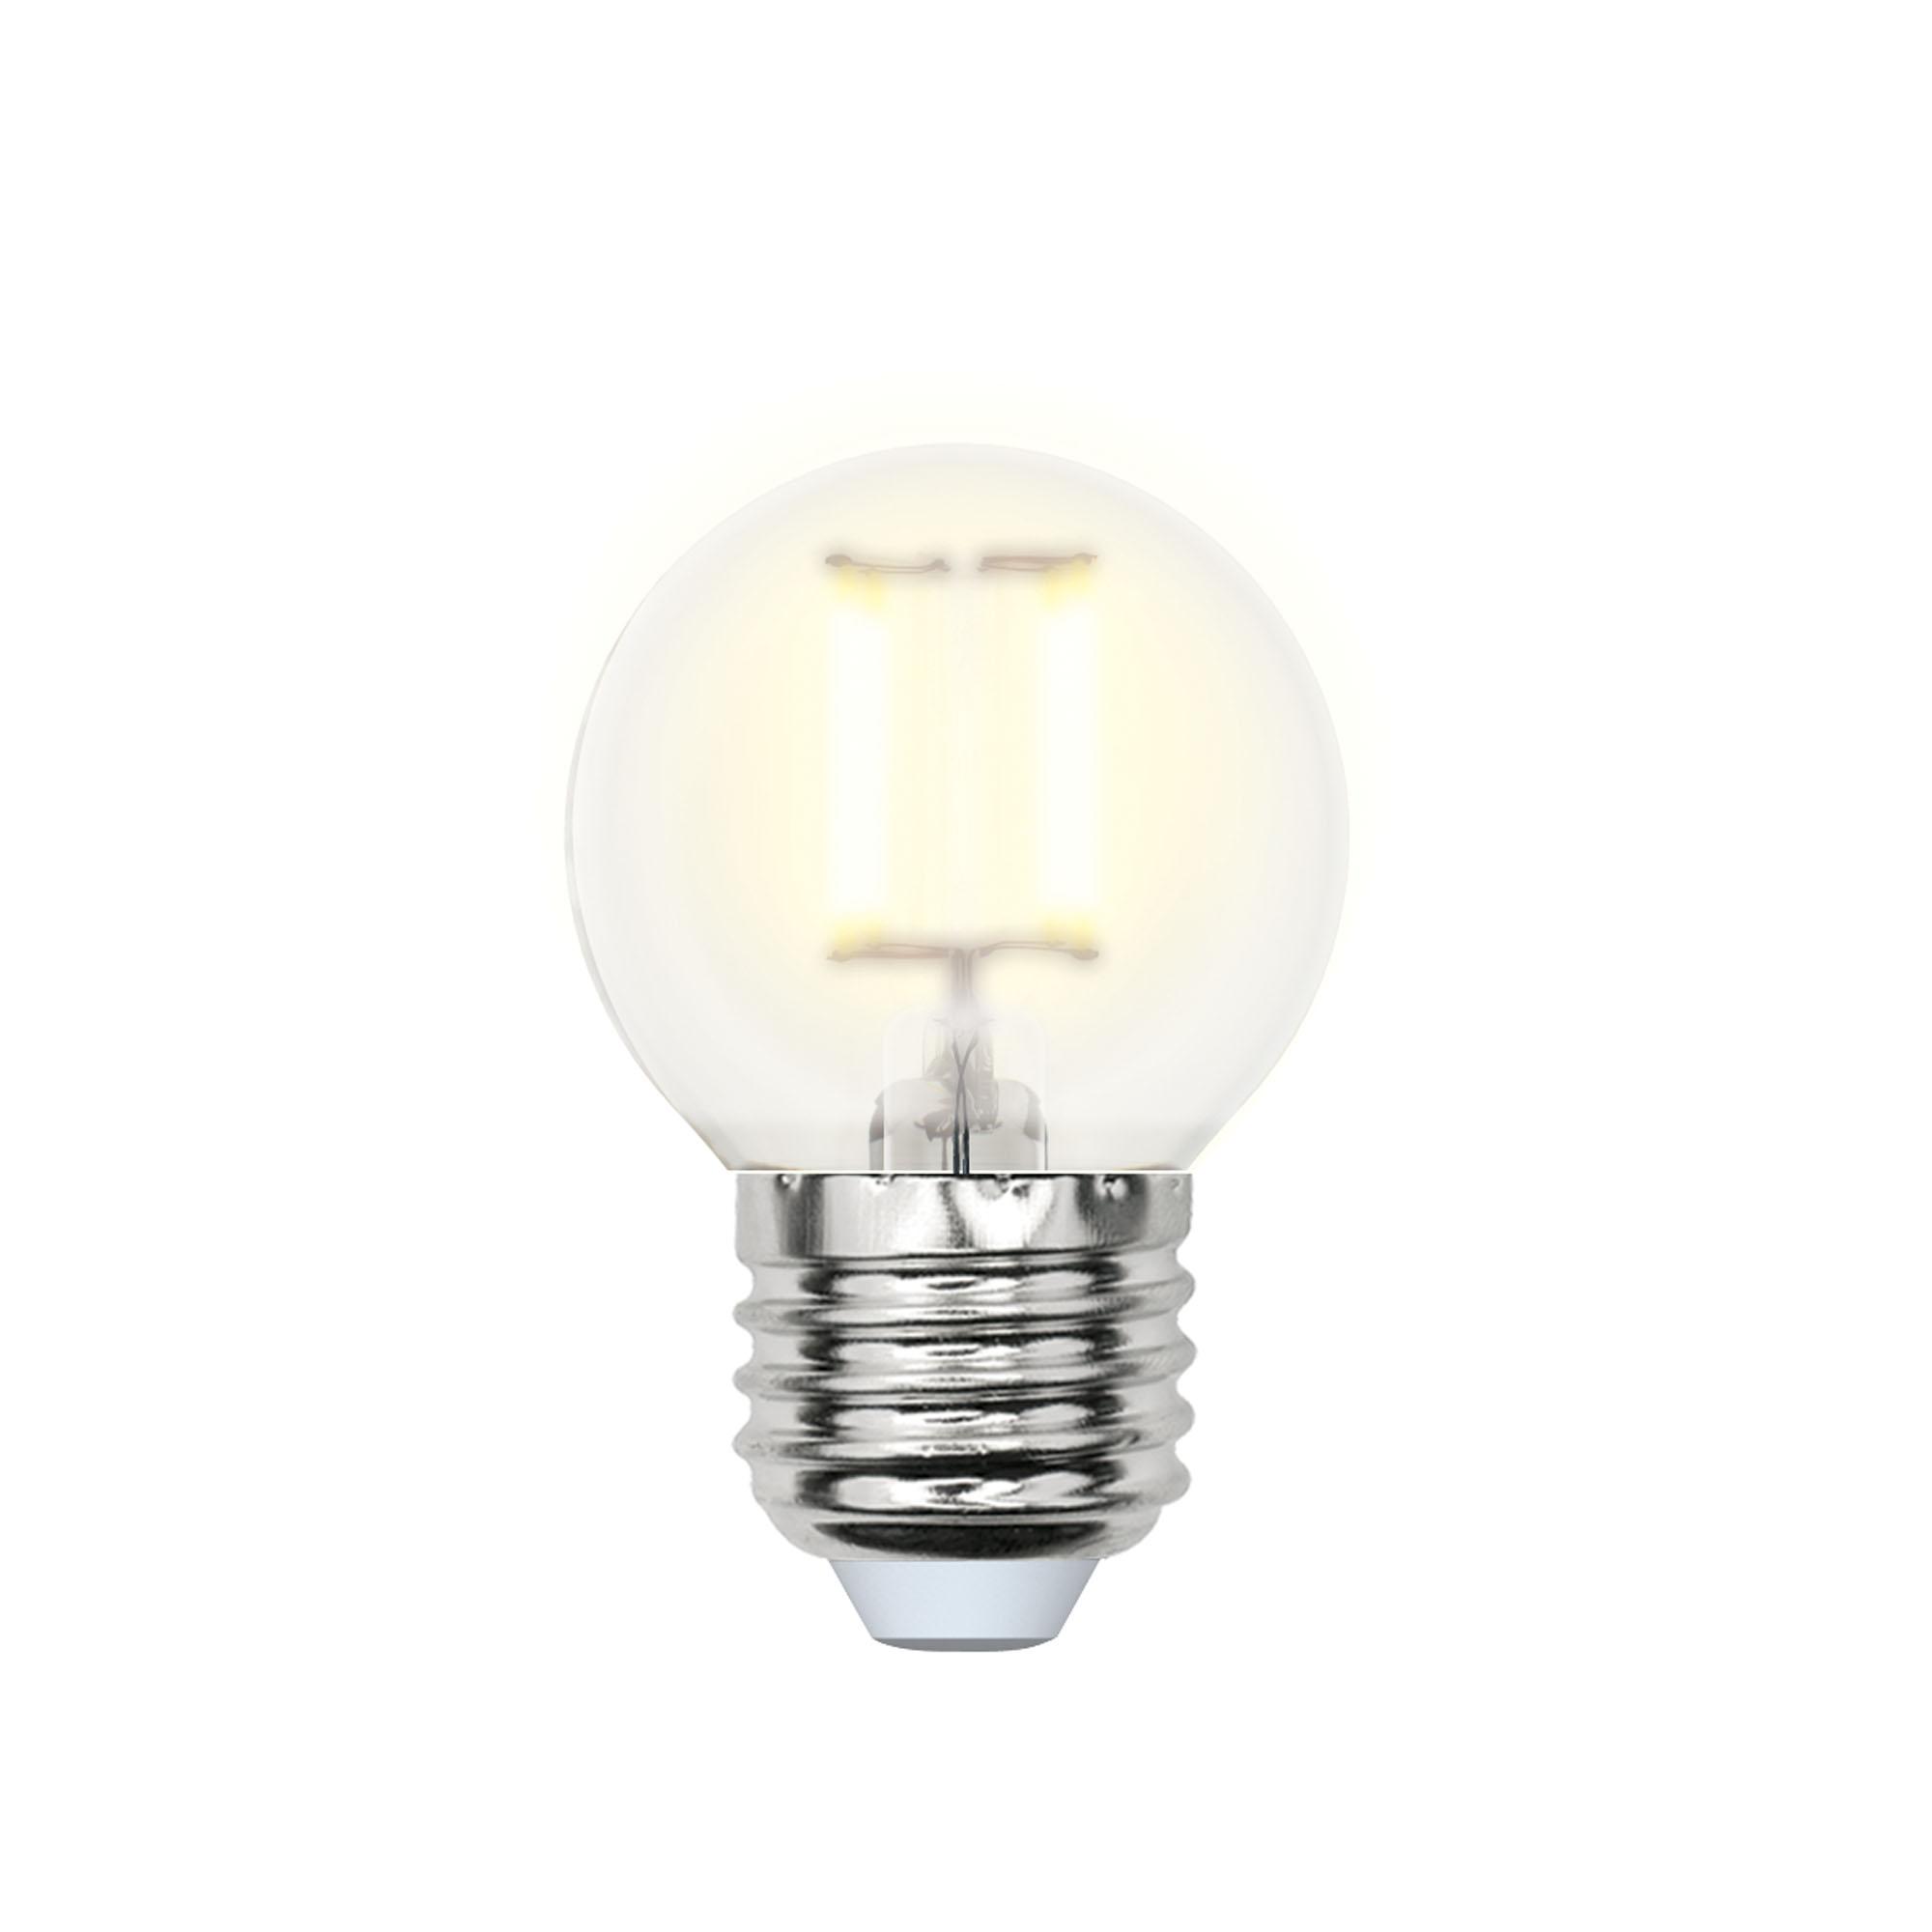 Лампа светодиодная Uniel Led-g45-6w/ww/e27/fr pls02wh 10шт лампа светодиодная uniel led c35 6w ww e14 fr pls02wh 10шт